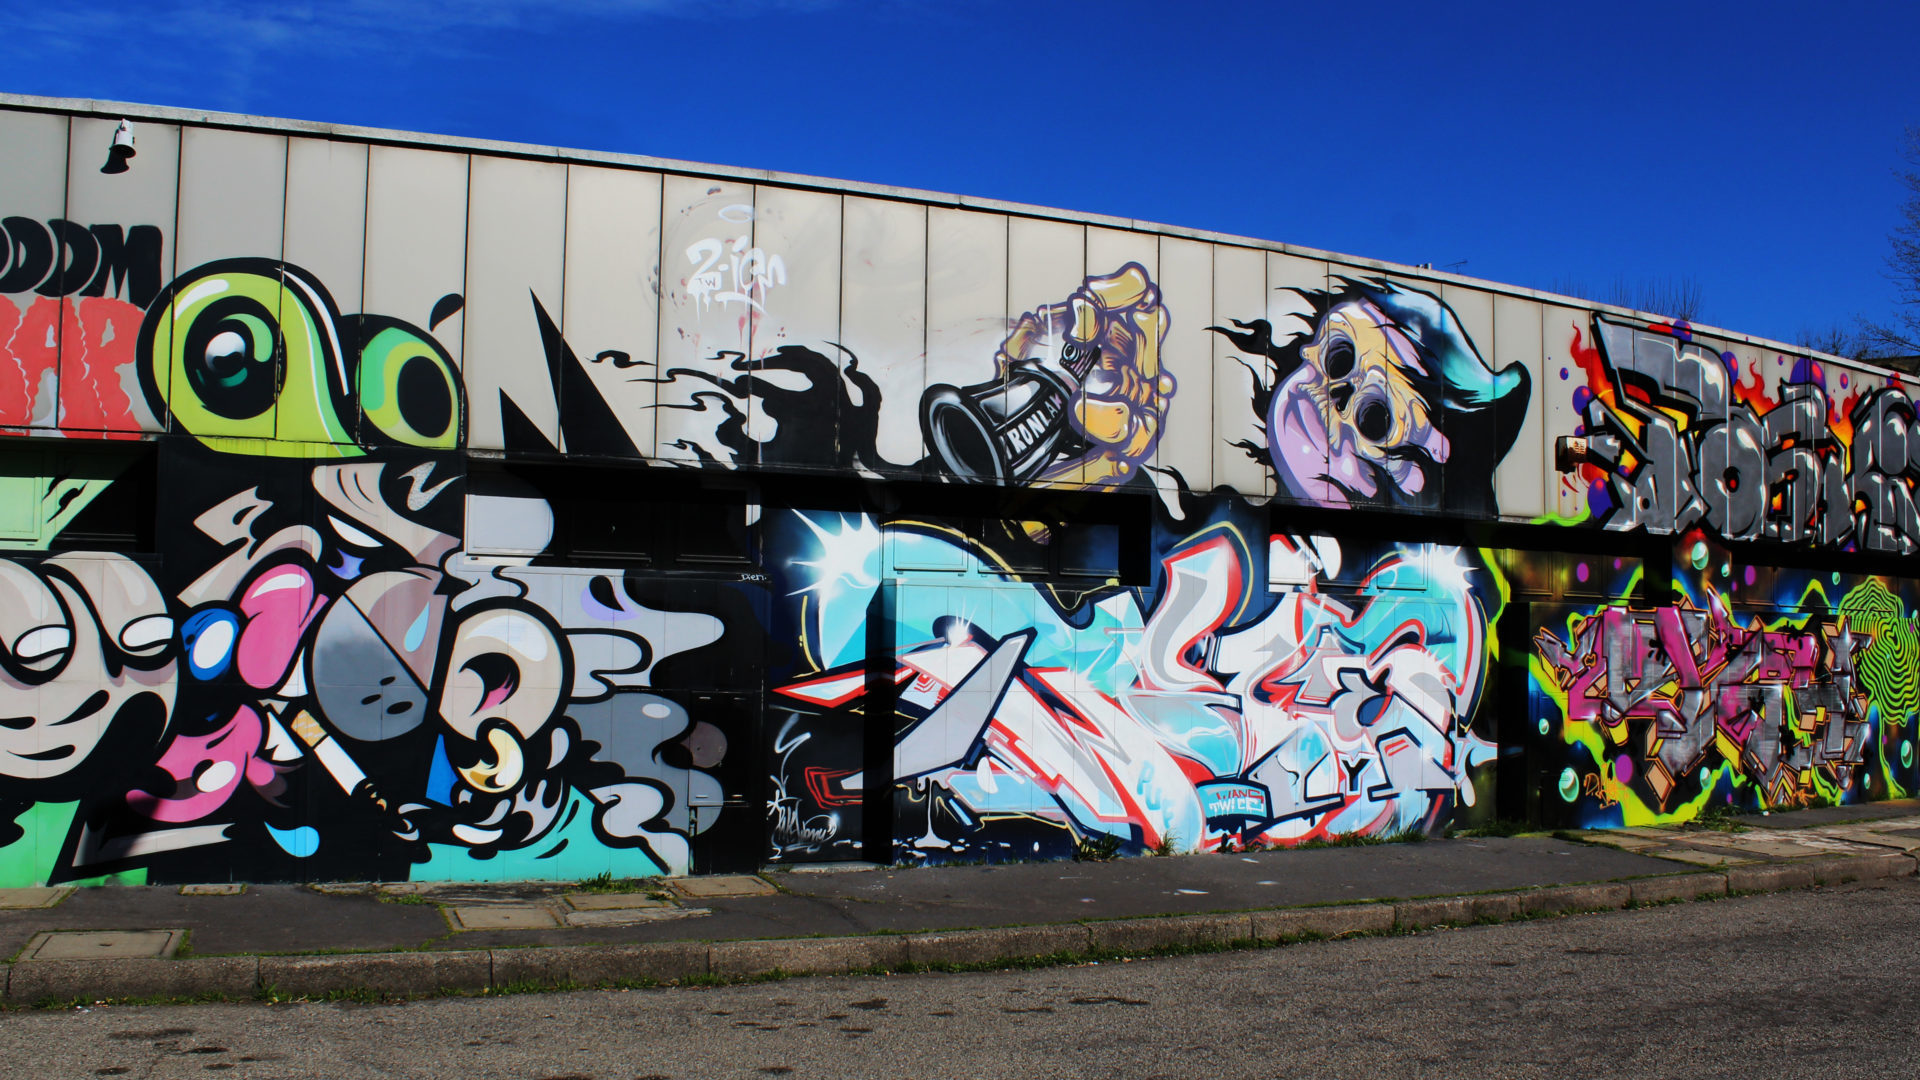 Erics + Wany + Fosk + Klose